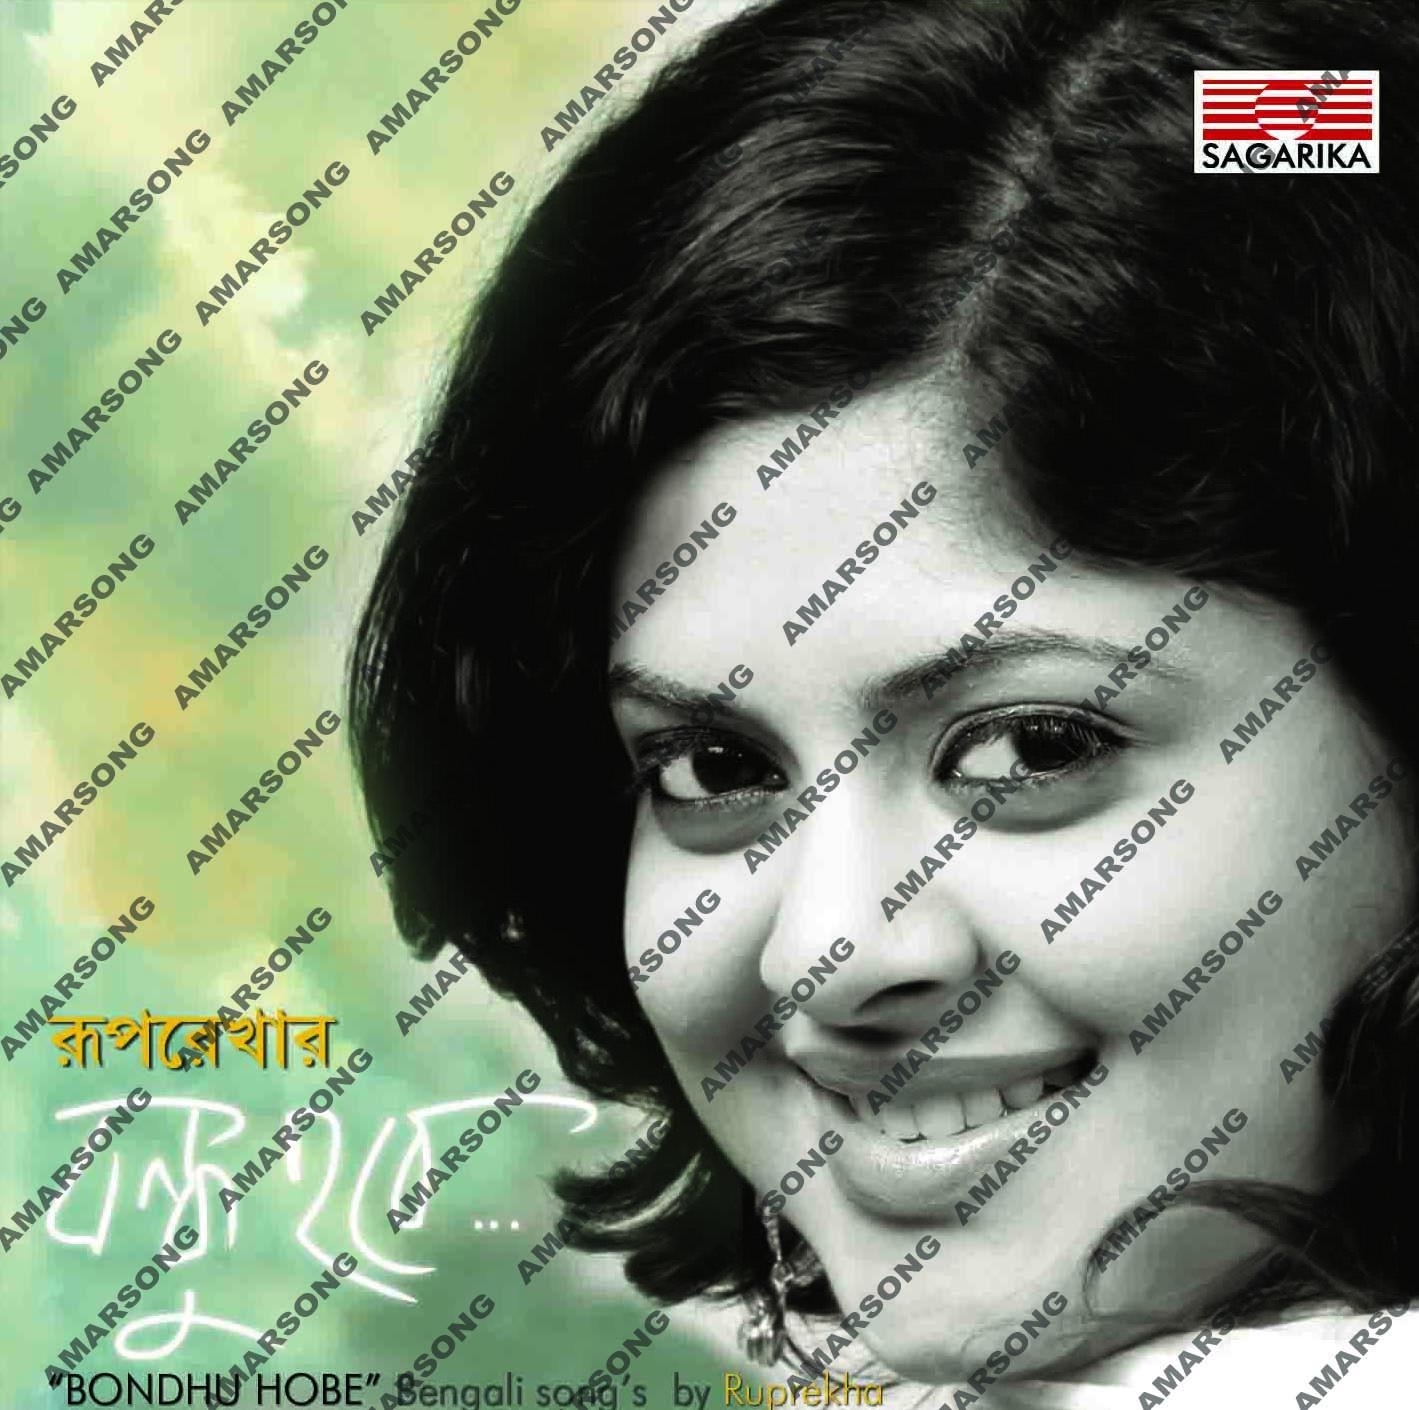 Bondhu Hobe - Ruprekha Banerjee Mp3 Download 128Kbps